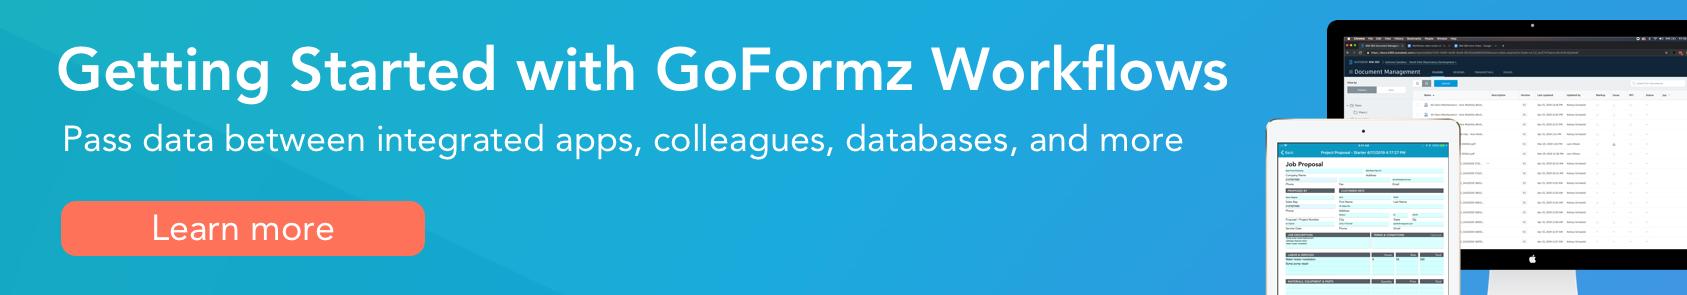 Getting Started With GoFormz Workflows